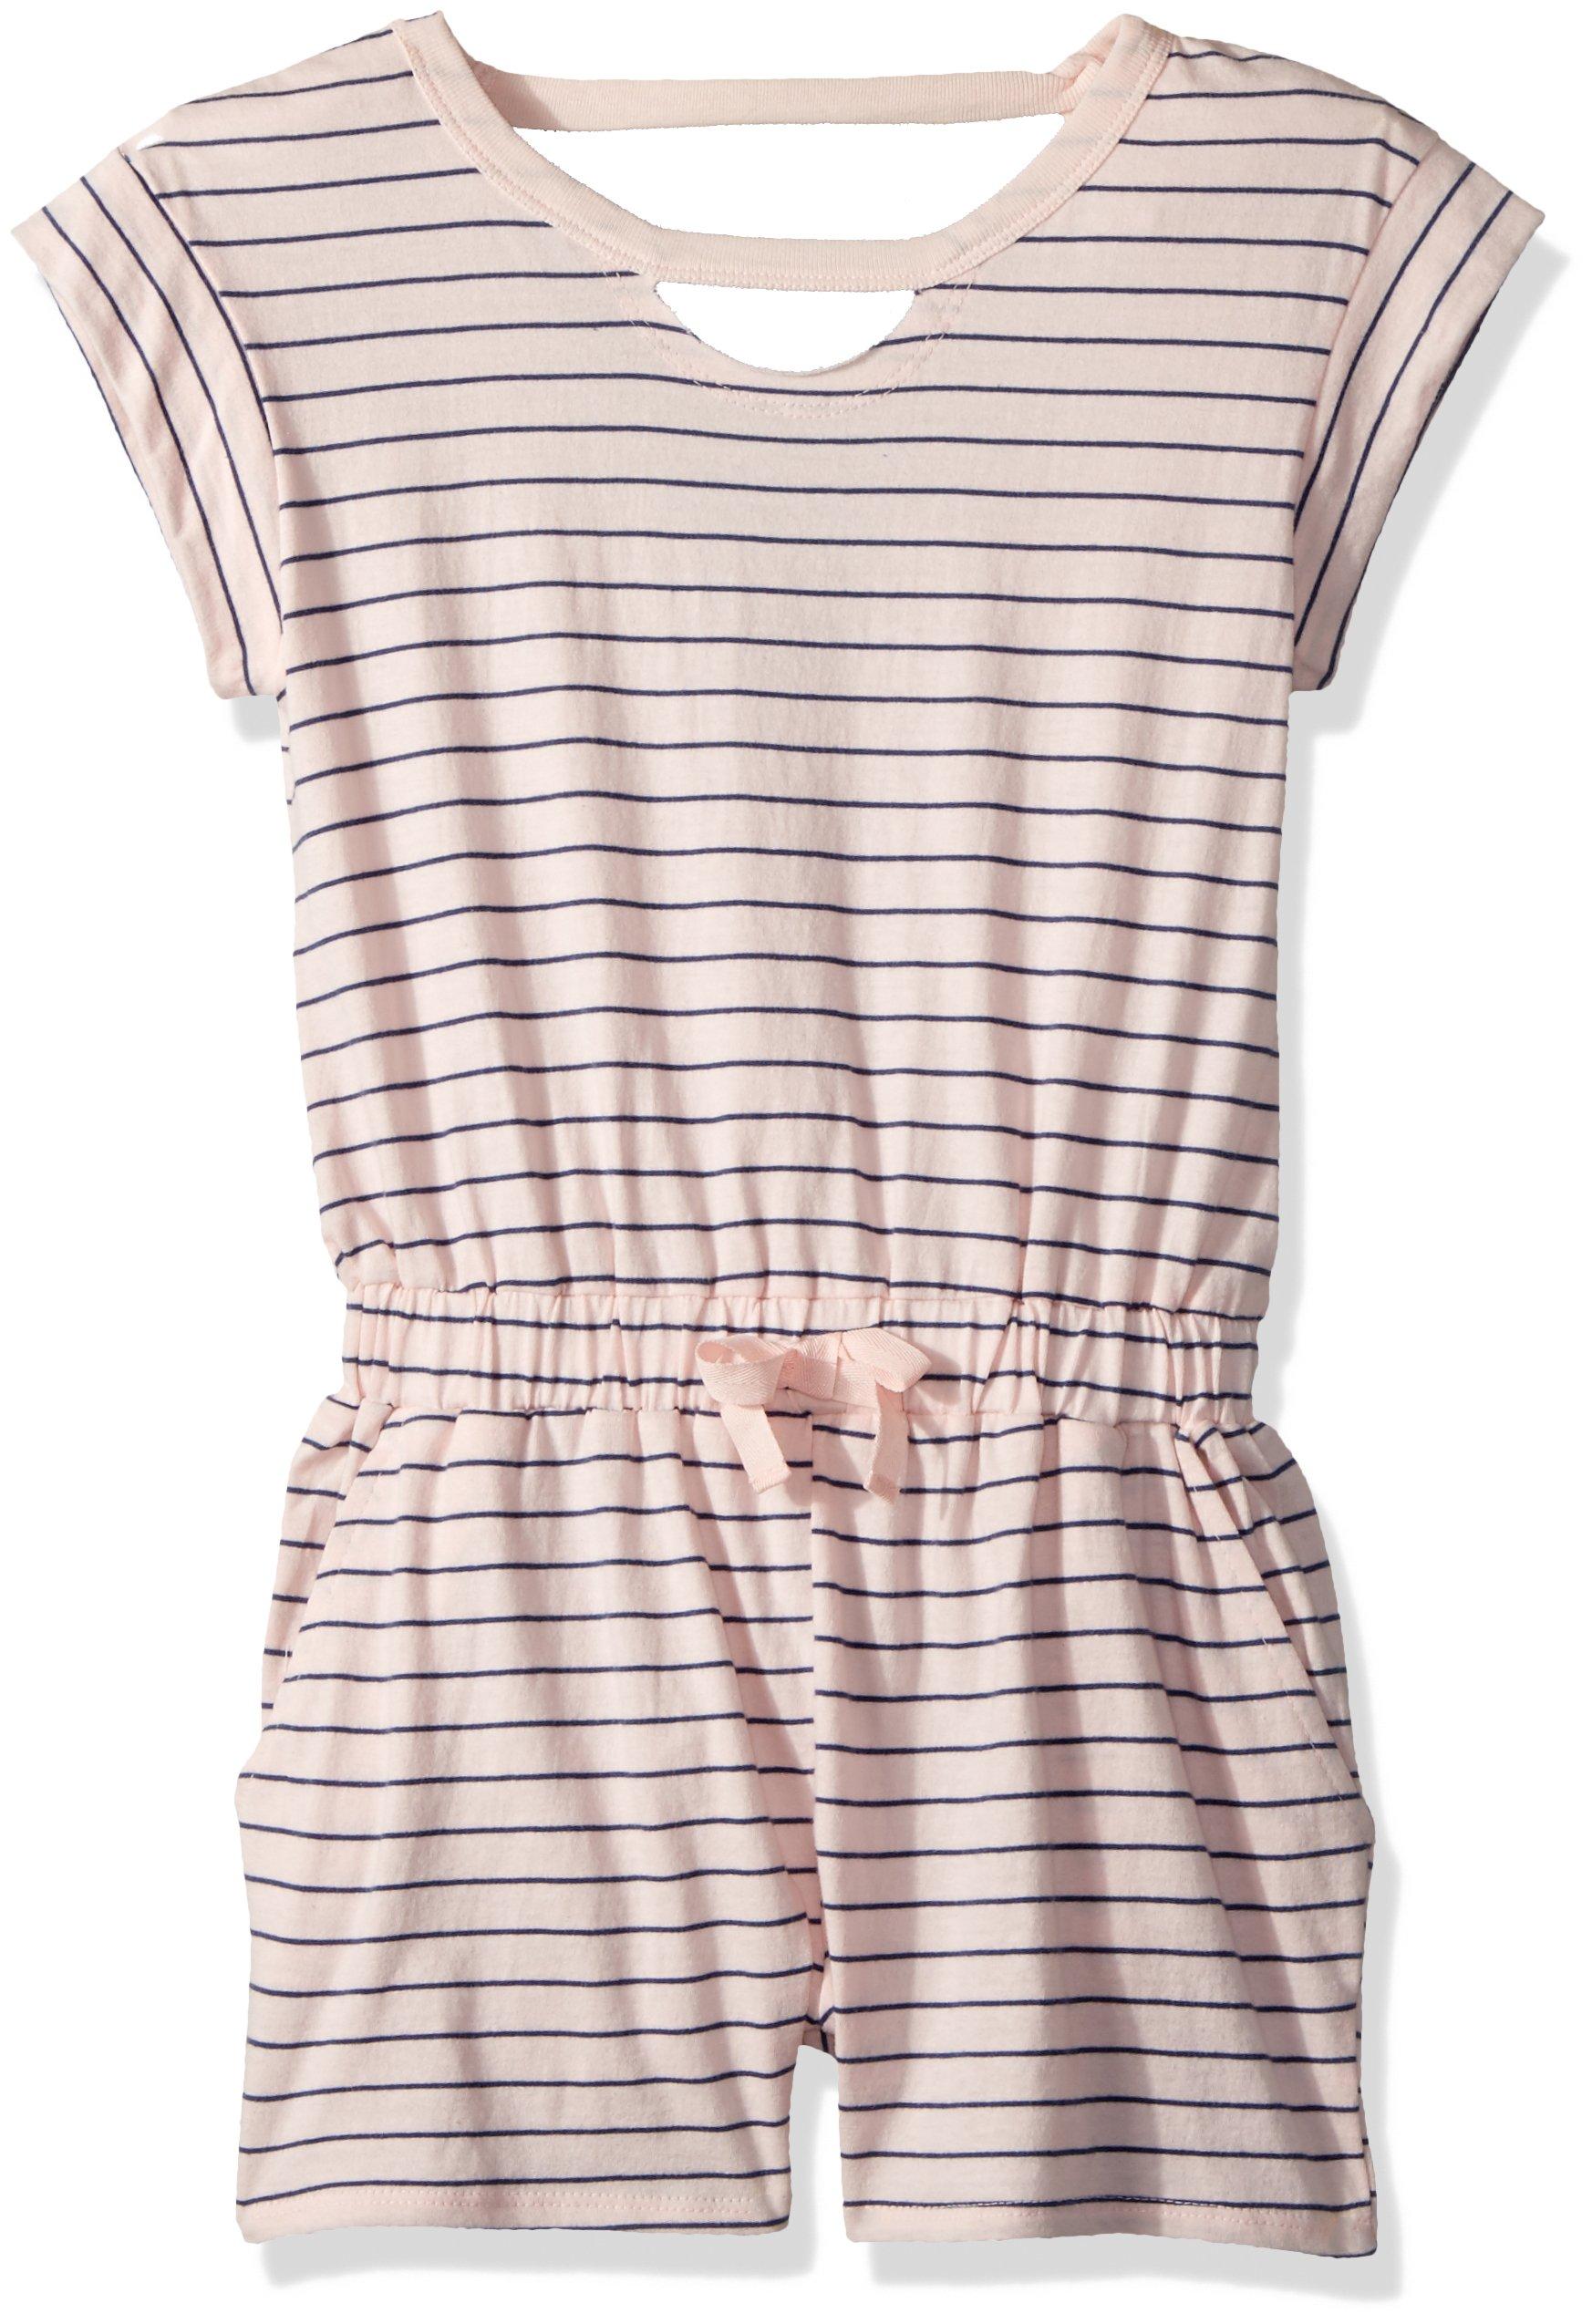 Splendid Big Girls' Yarn Dyed Stripe Romper, Seafoam Pink, 12